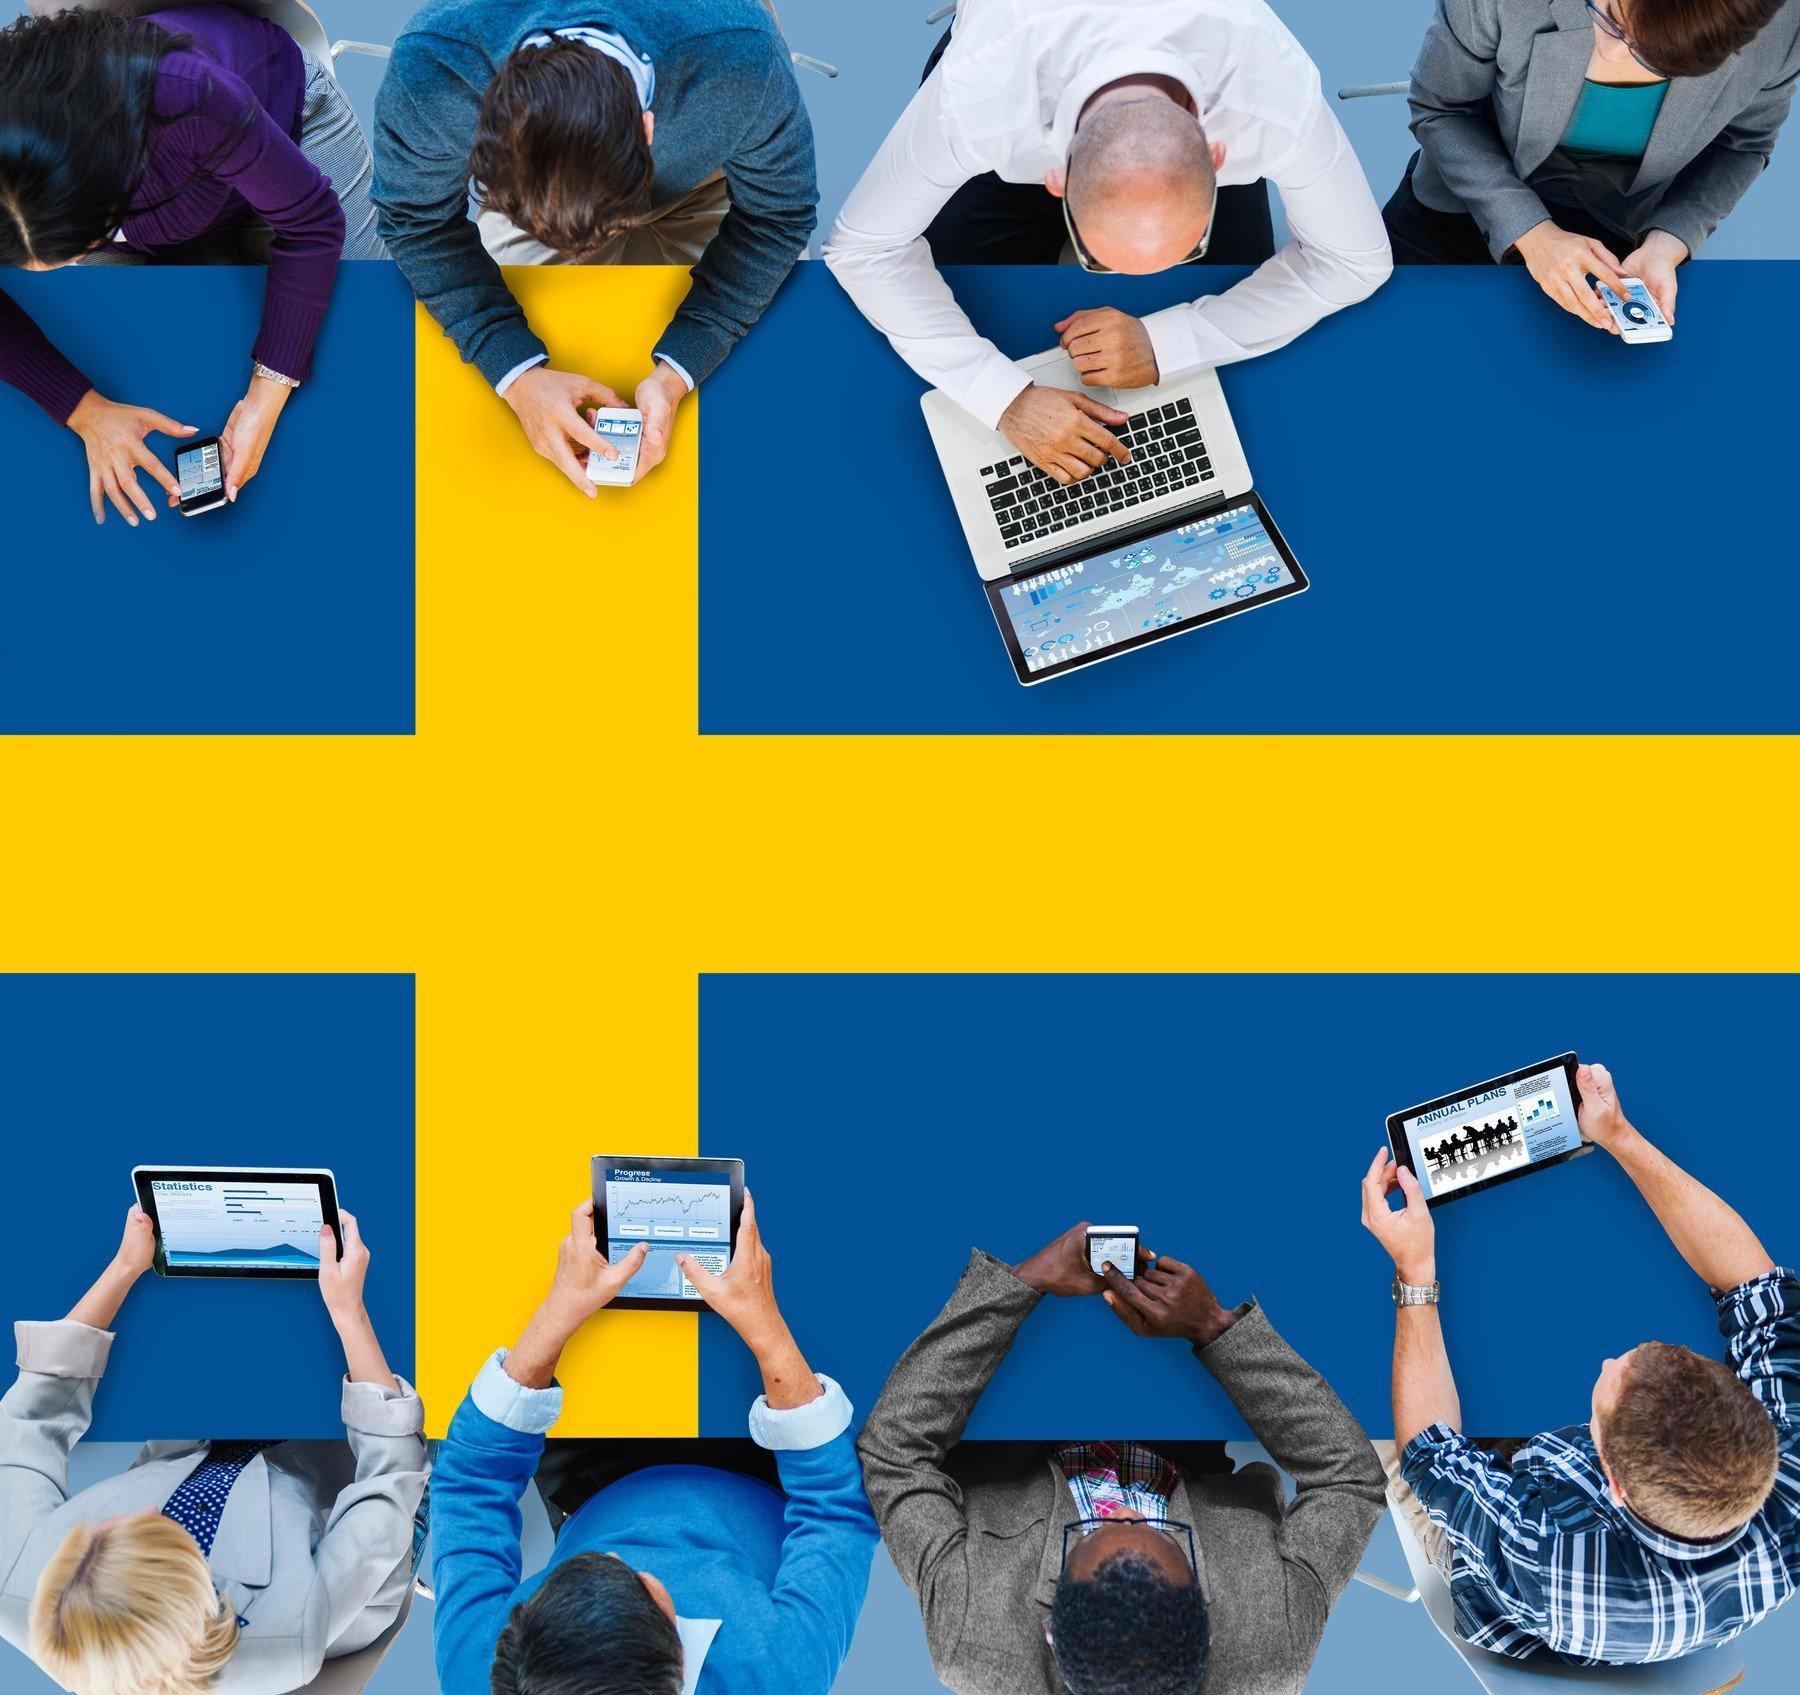 Konec švédského experimentu s Twitterem pro lidi